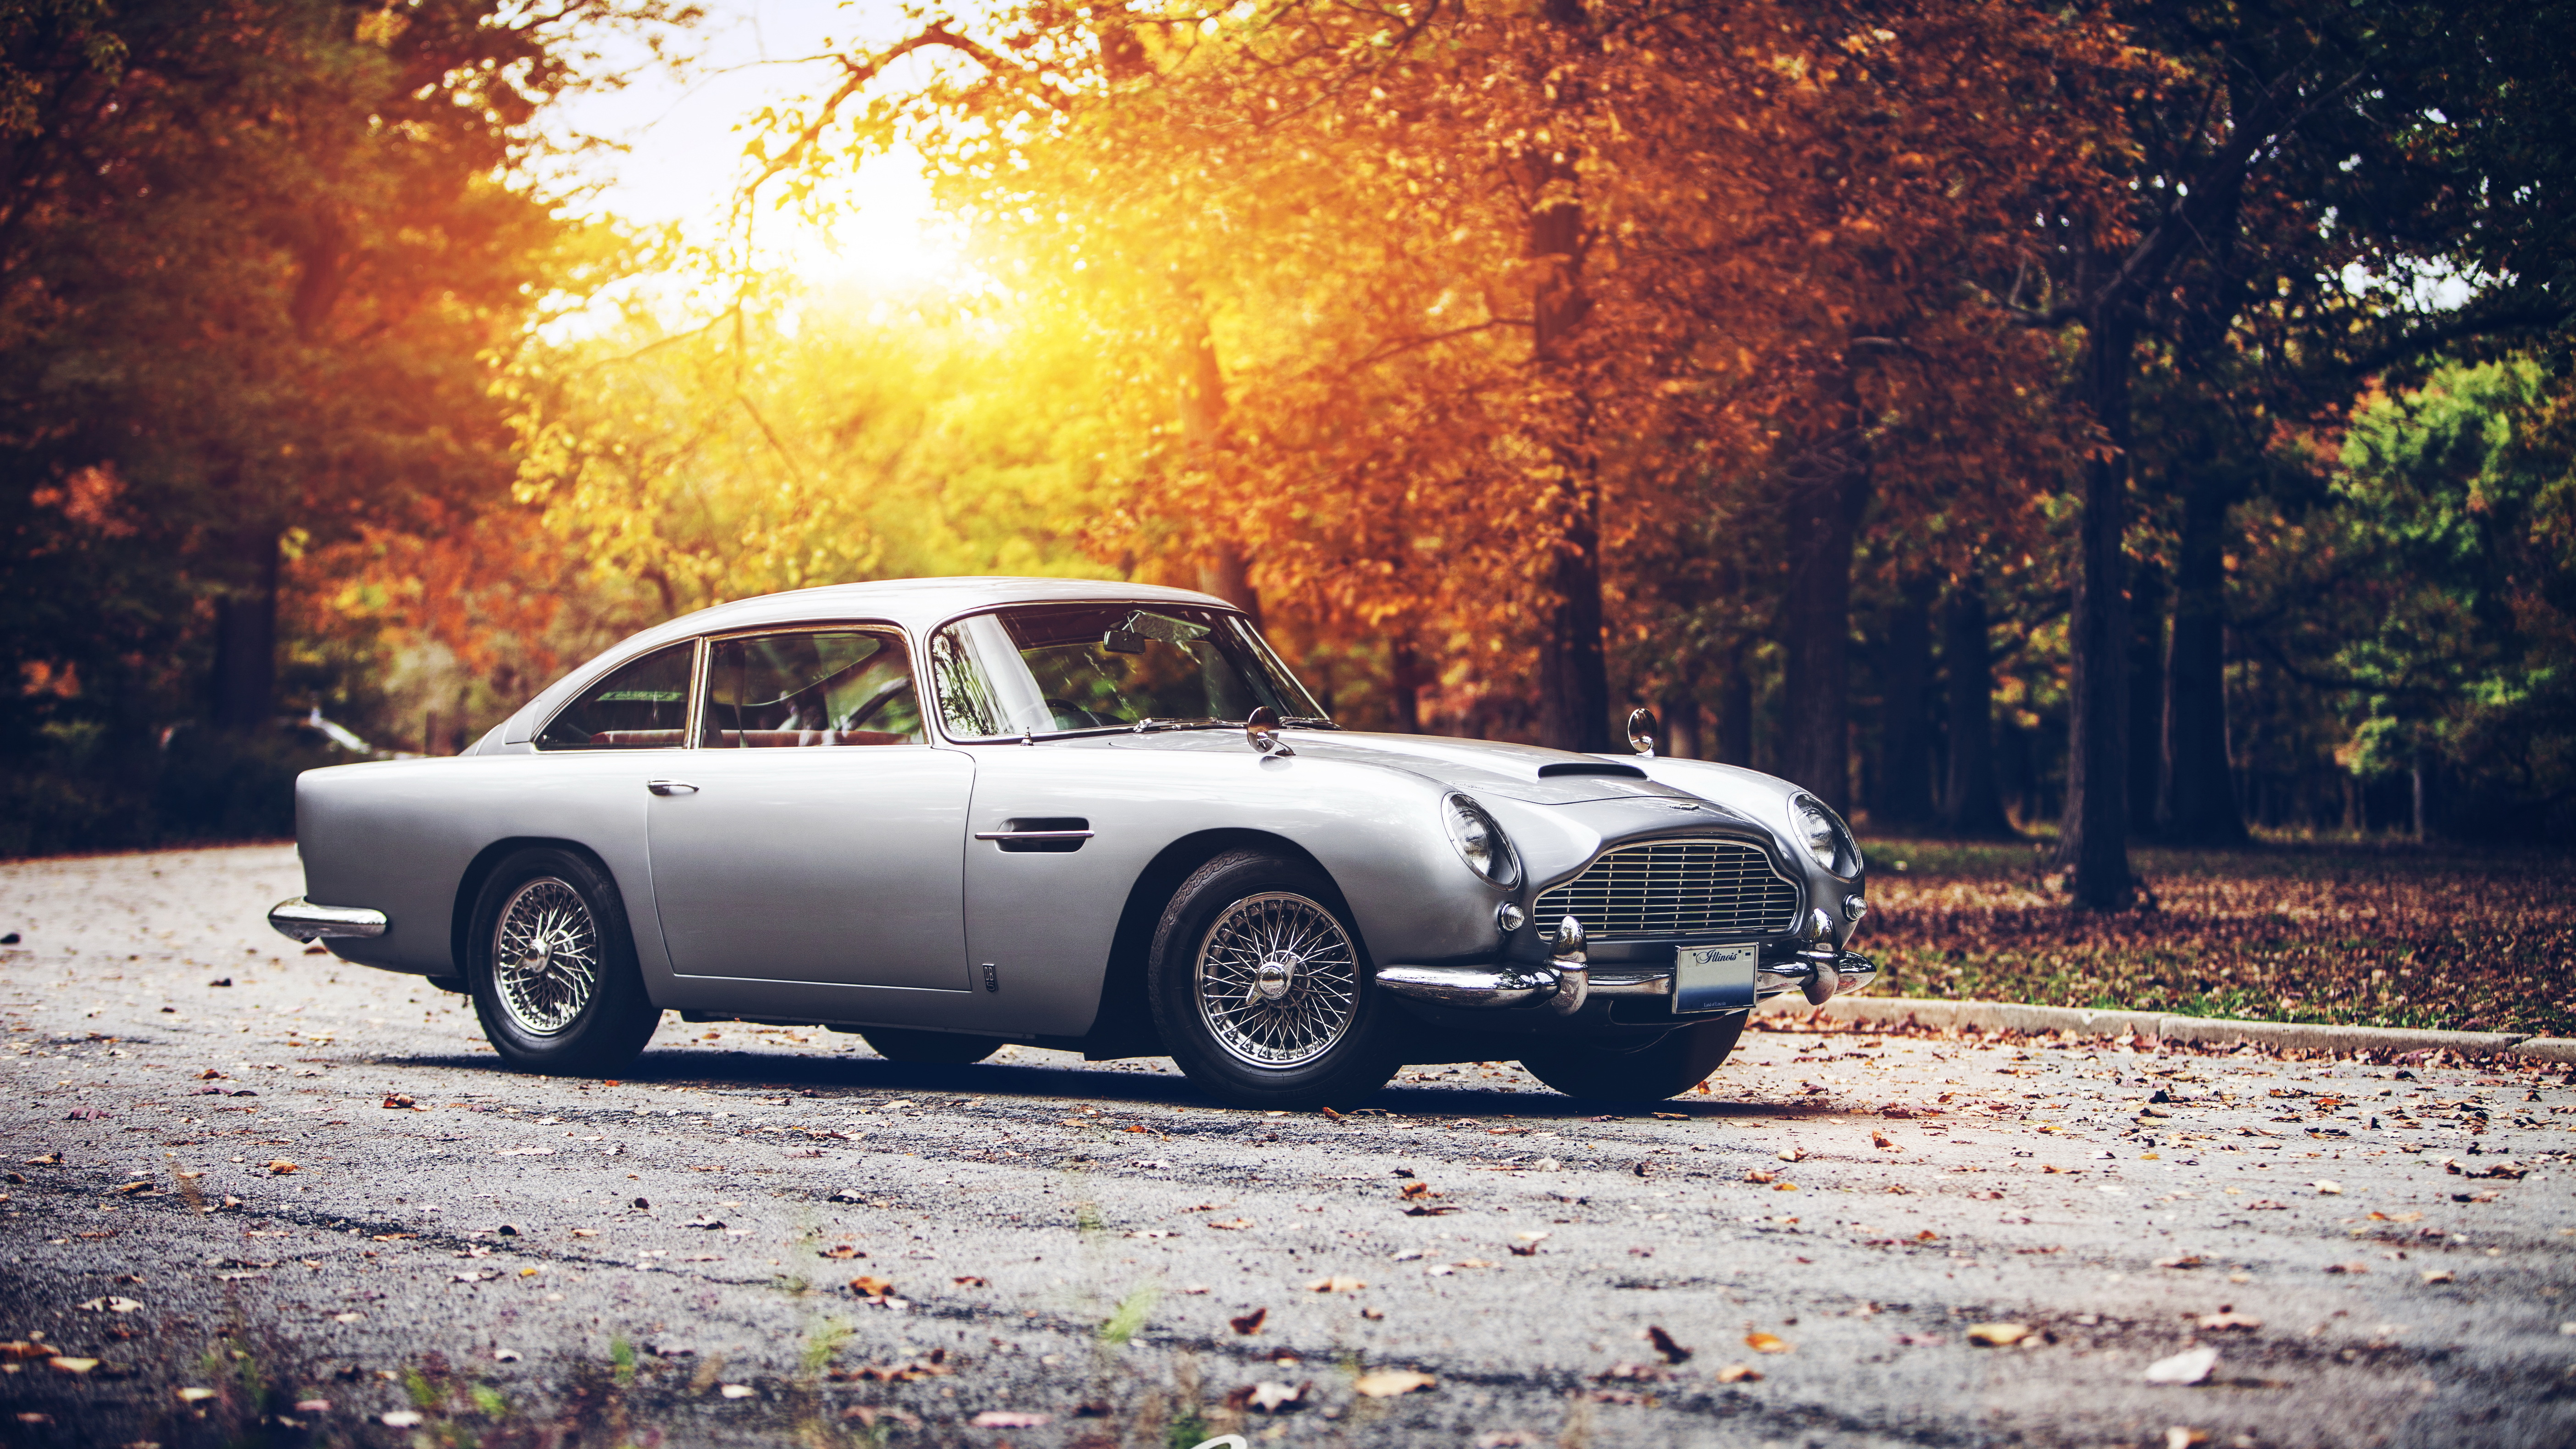 Aston Martin DB5 Wallpapers 26 5616x3159